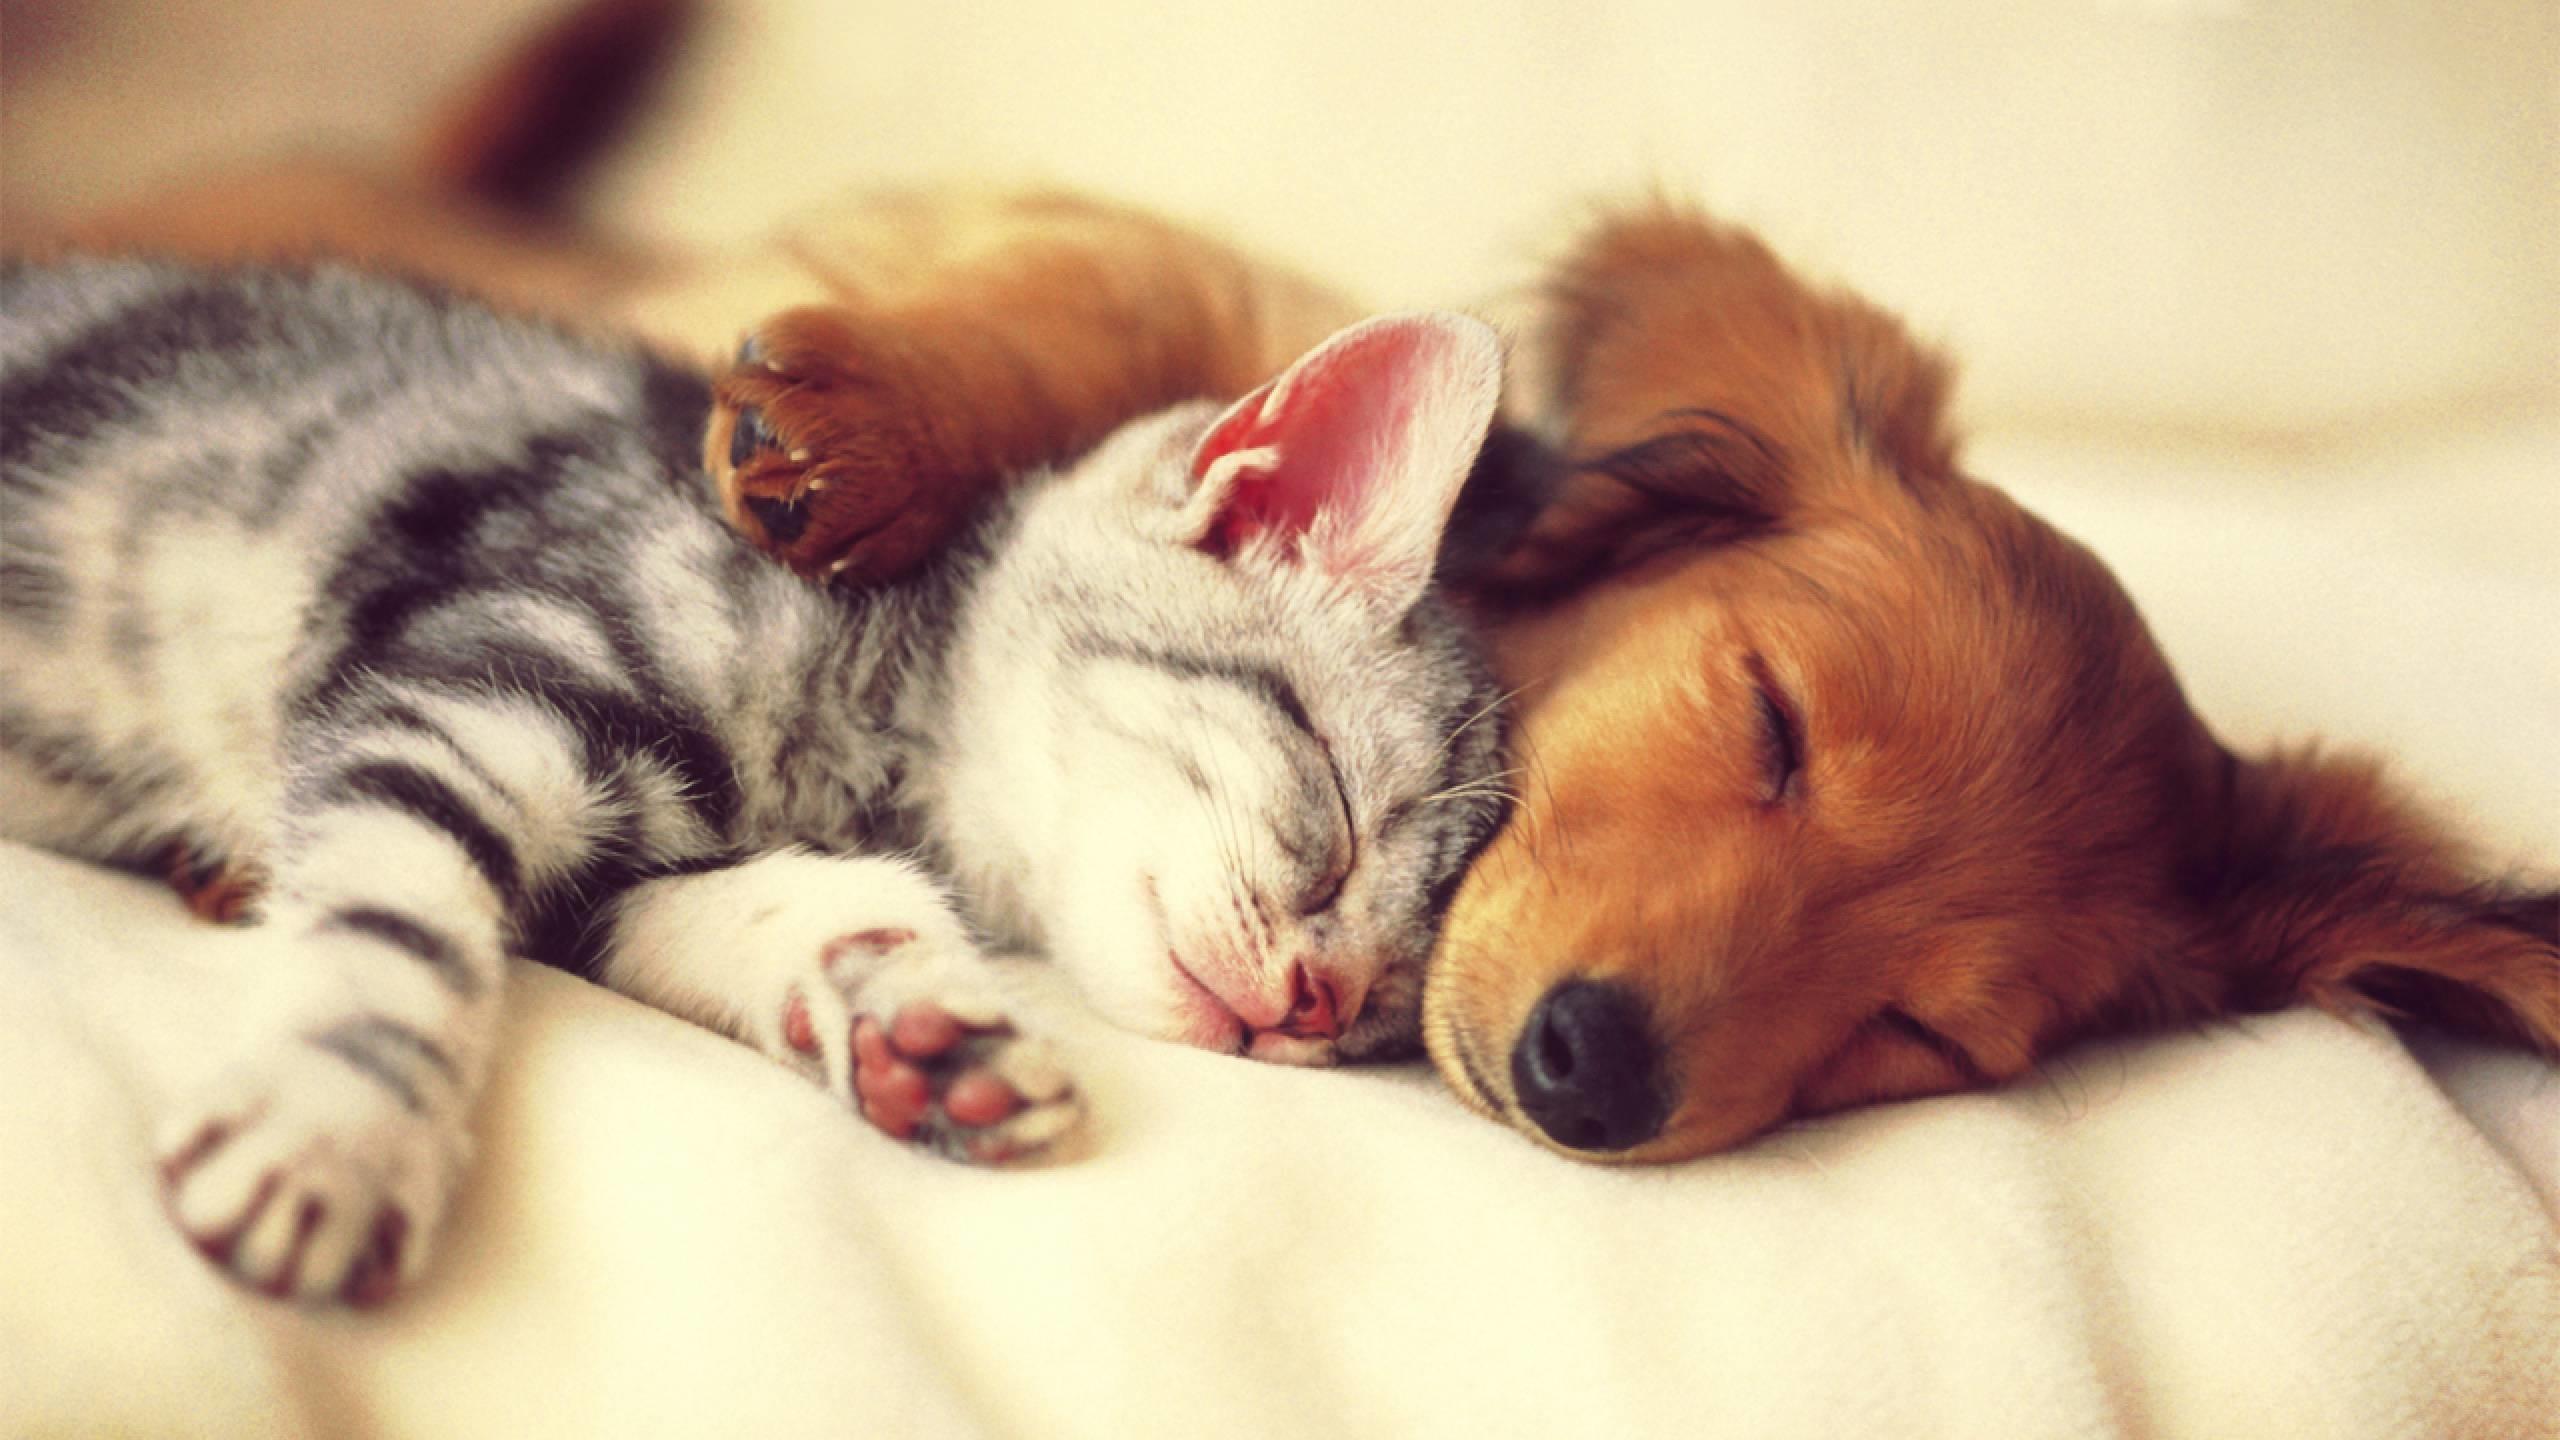 Cat And Dog Wallpaper Wallpapertag